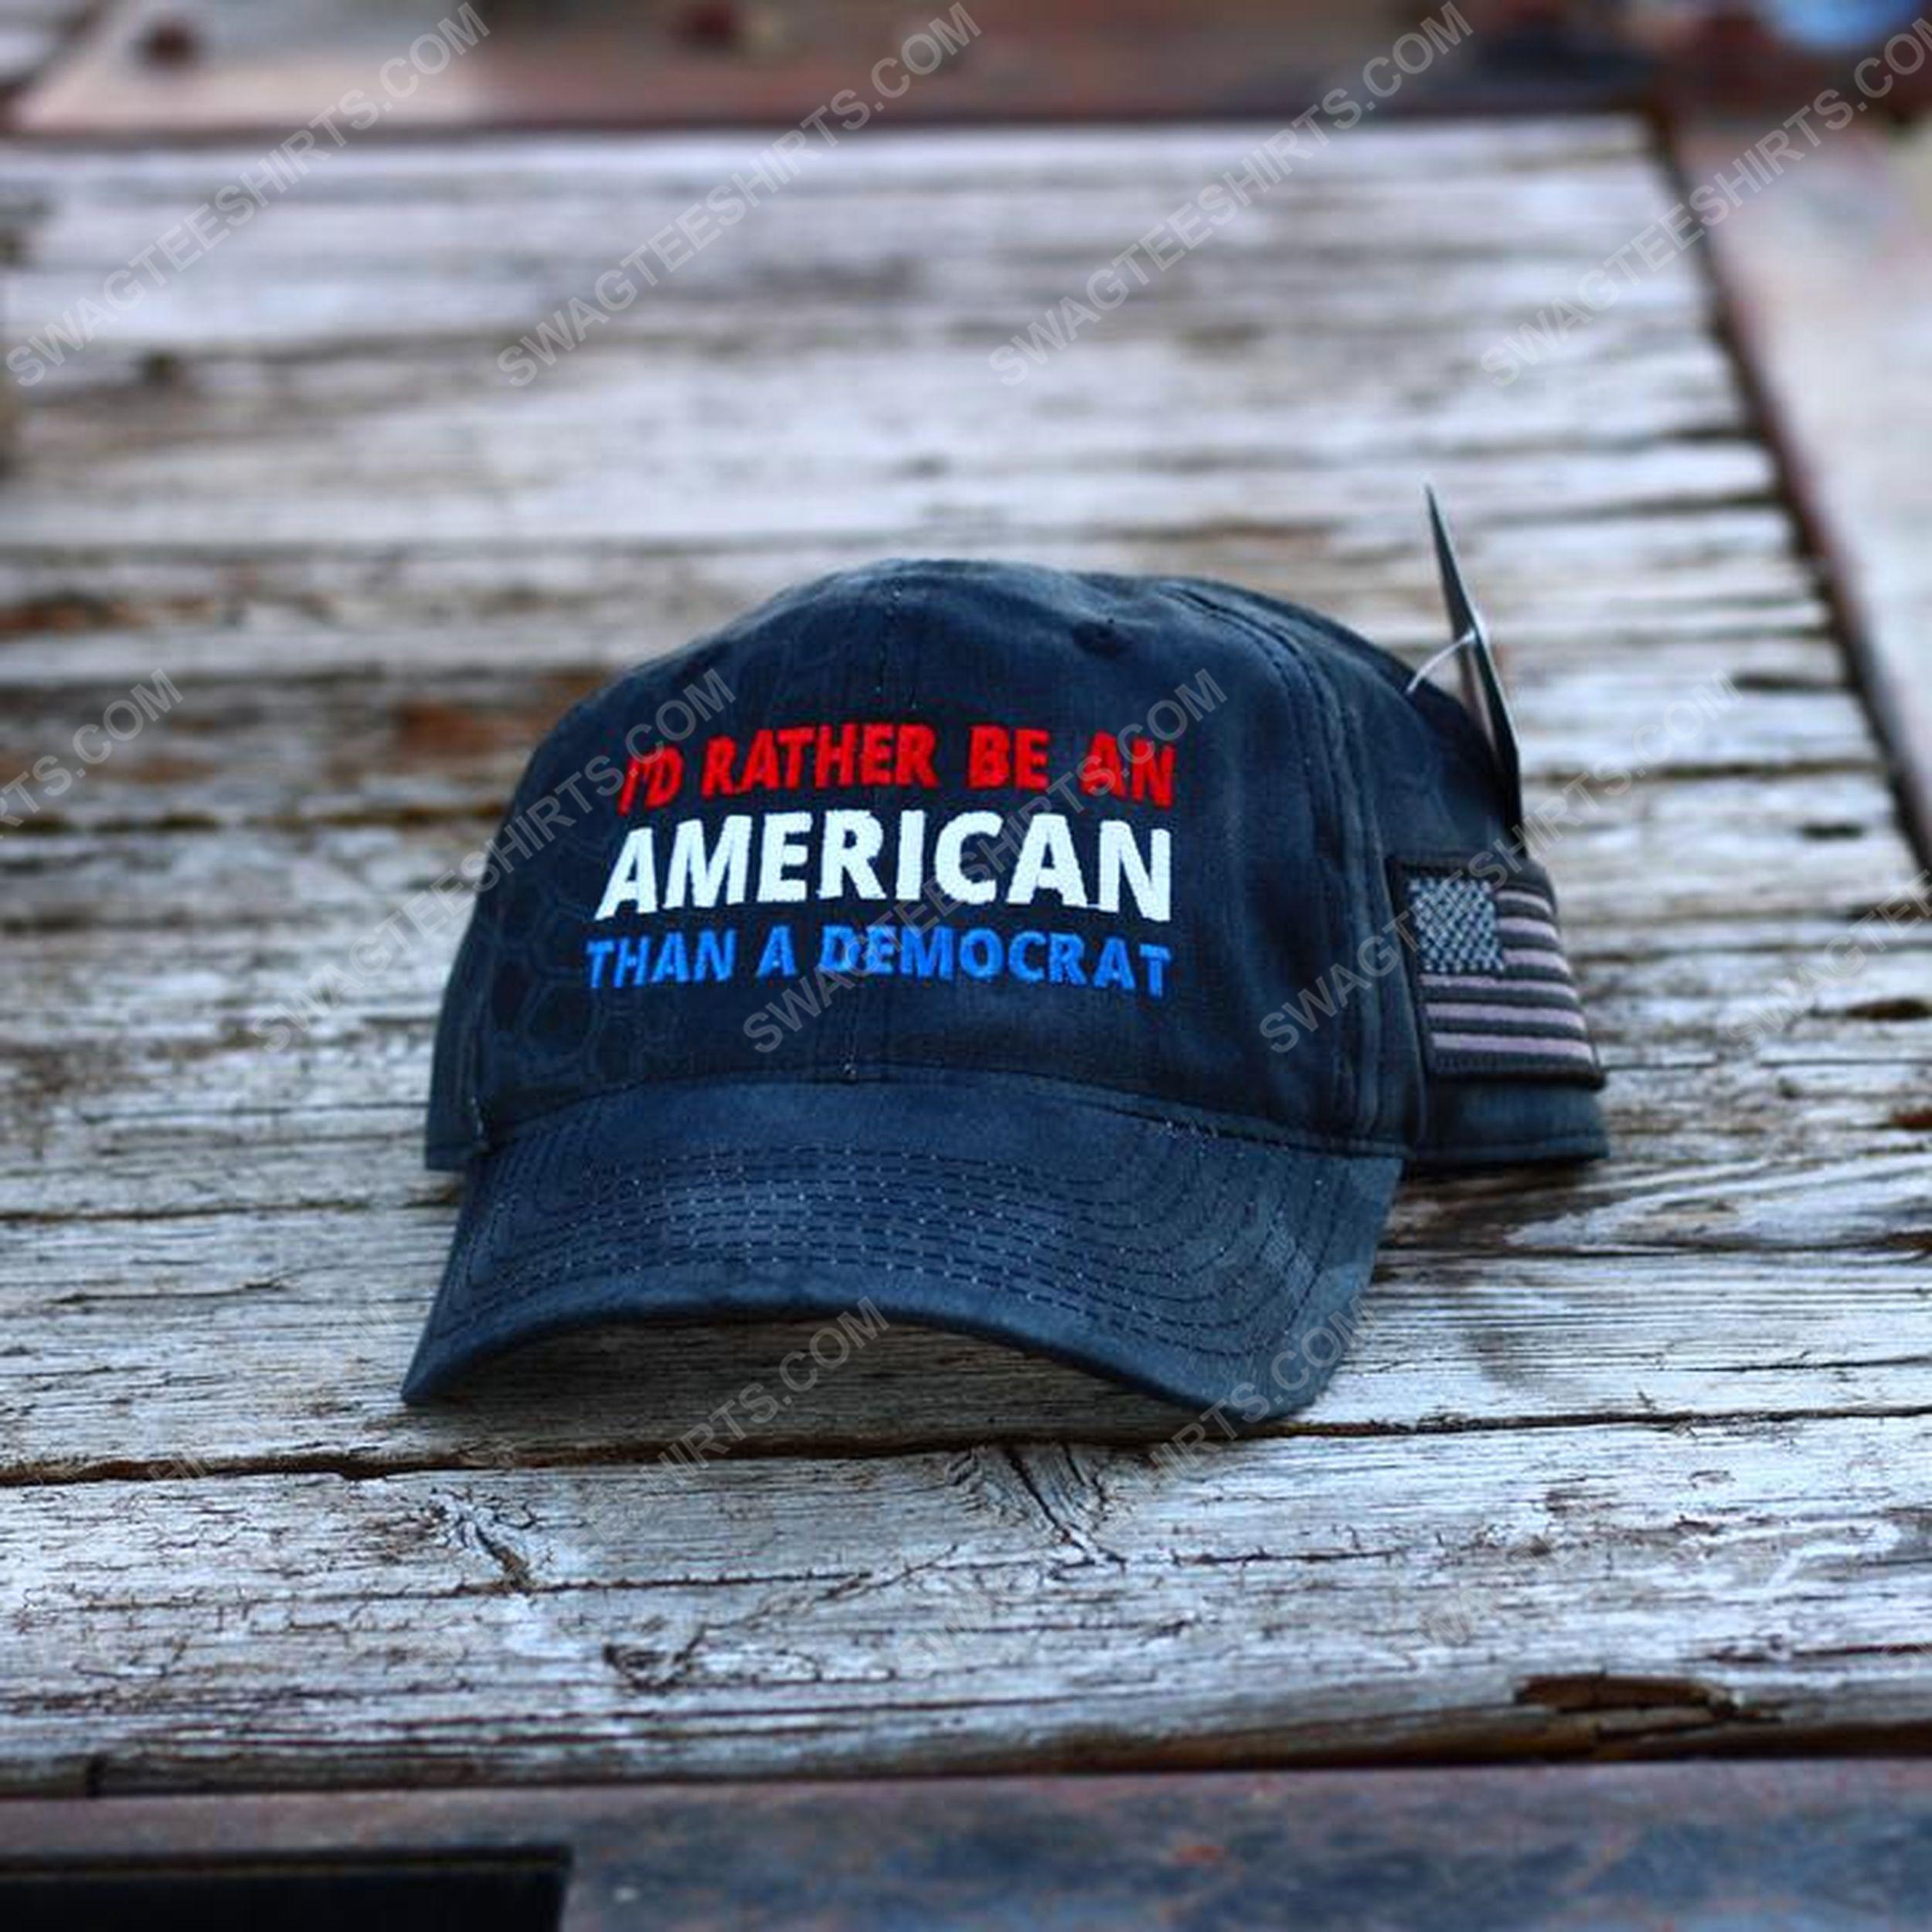 I'd rather be an american than a democrat full print classic hat 1 - Copy (2)